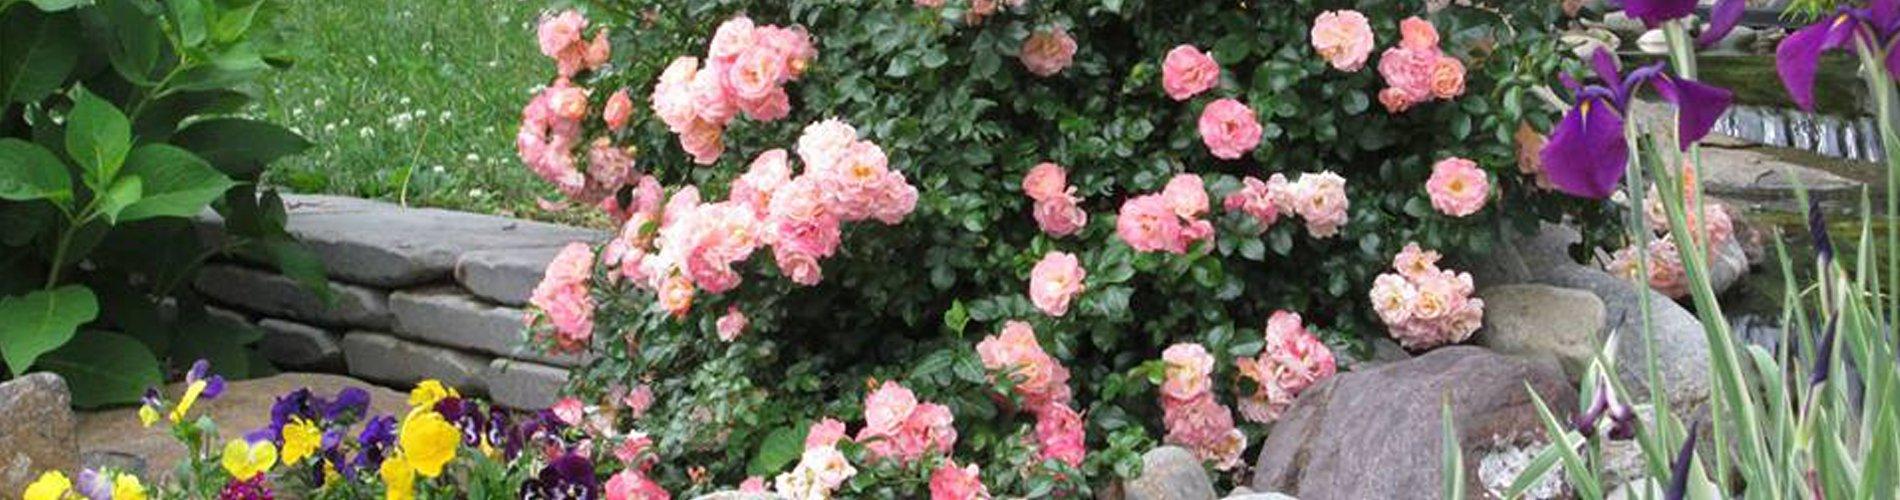 Peach Drift Rose above Pond - Newtown Square PA